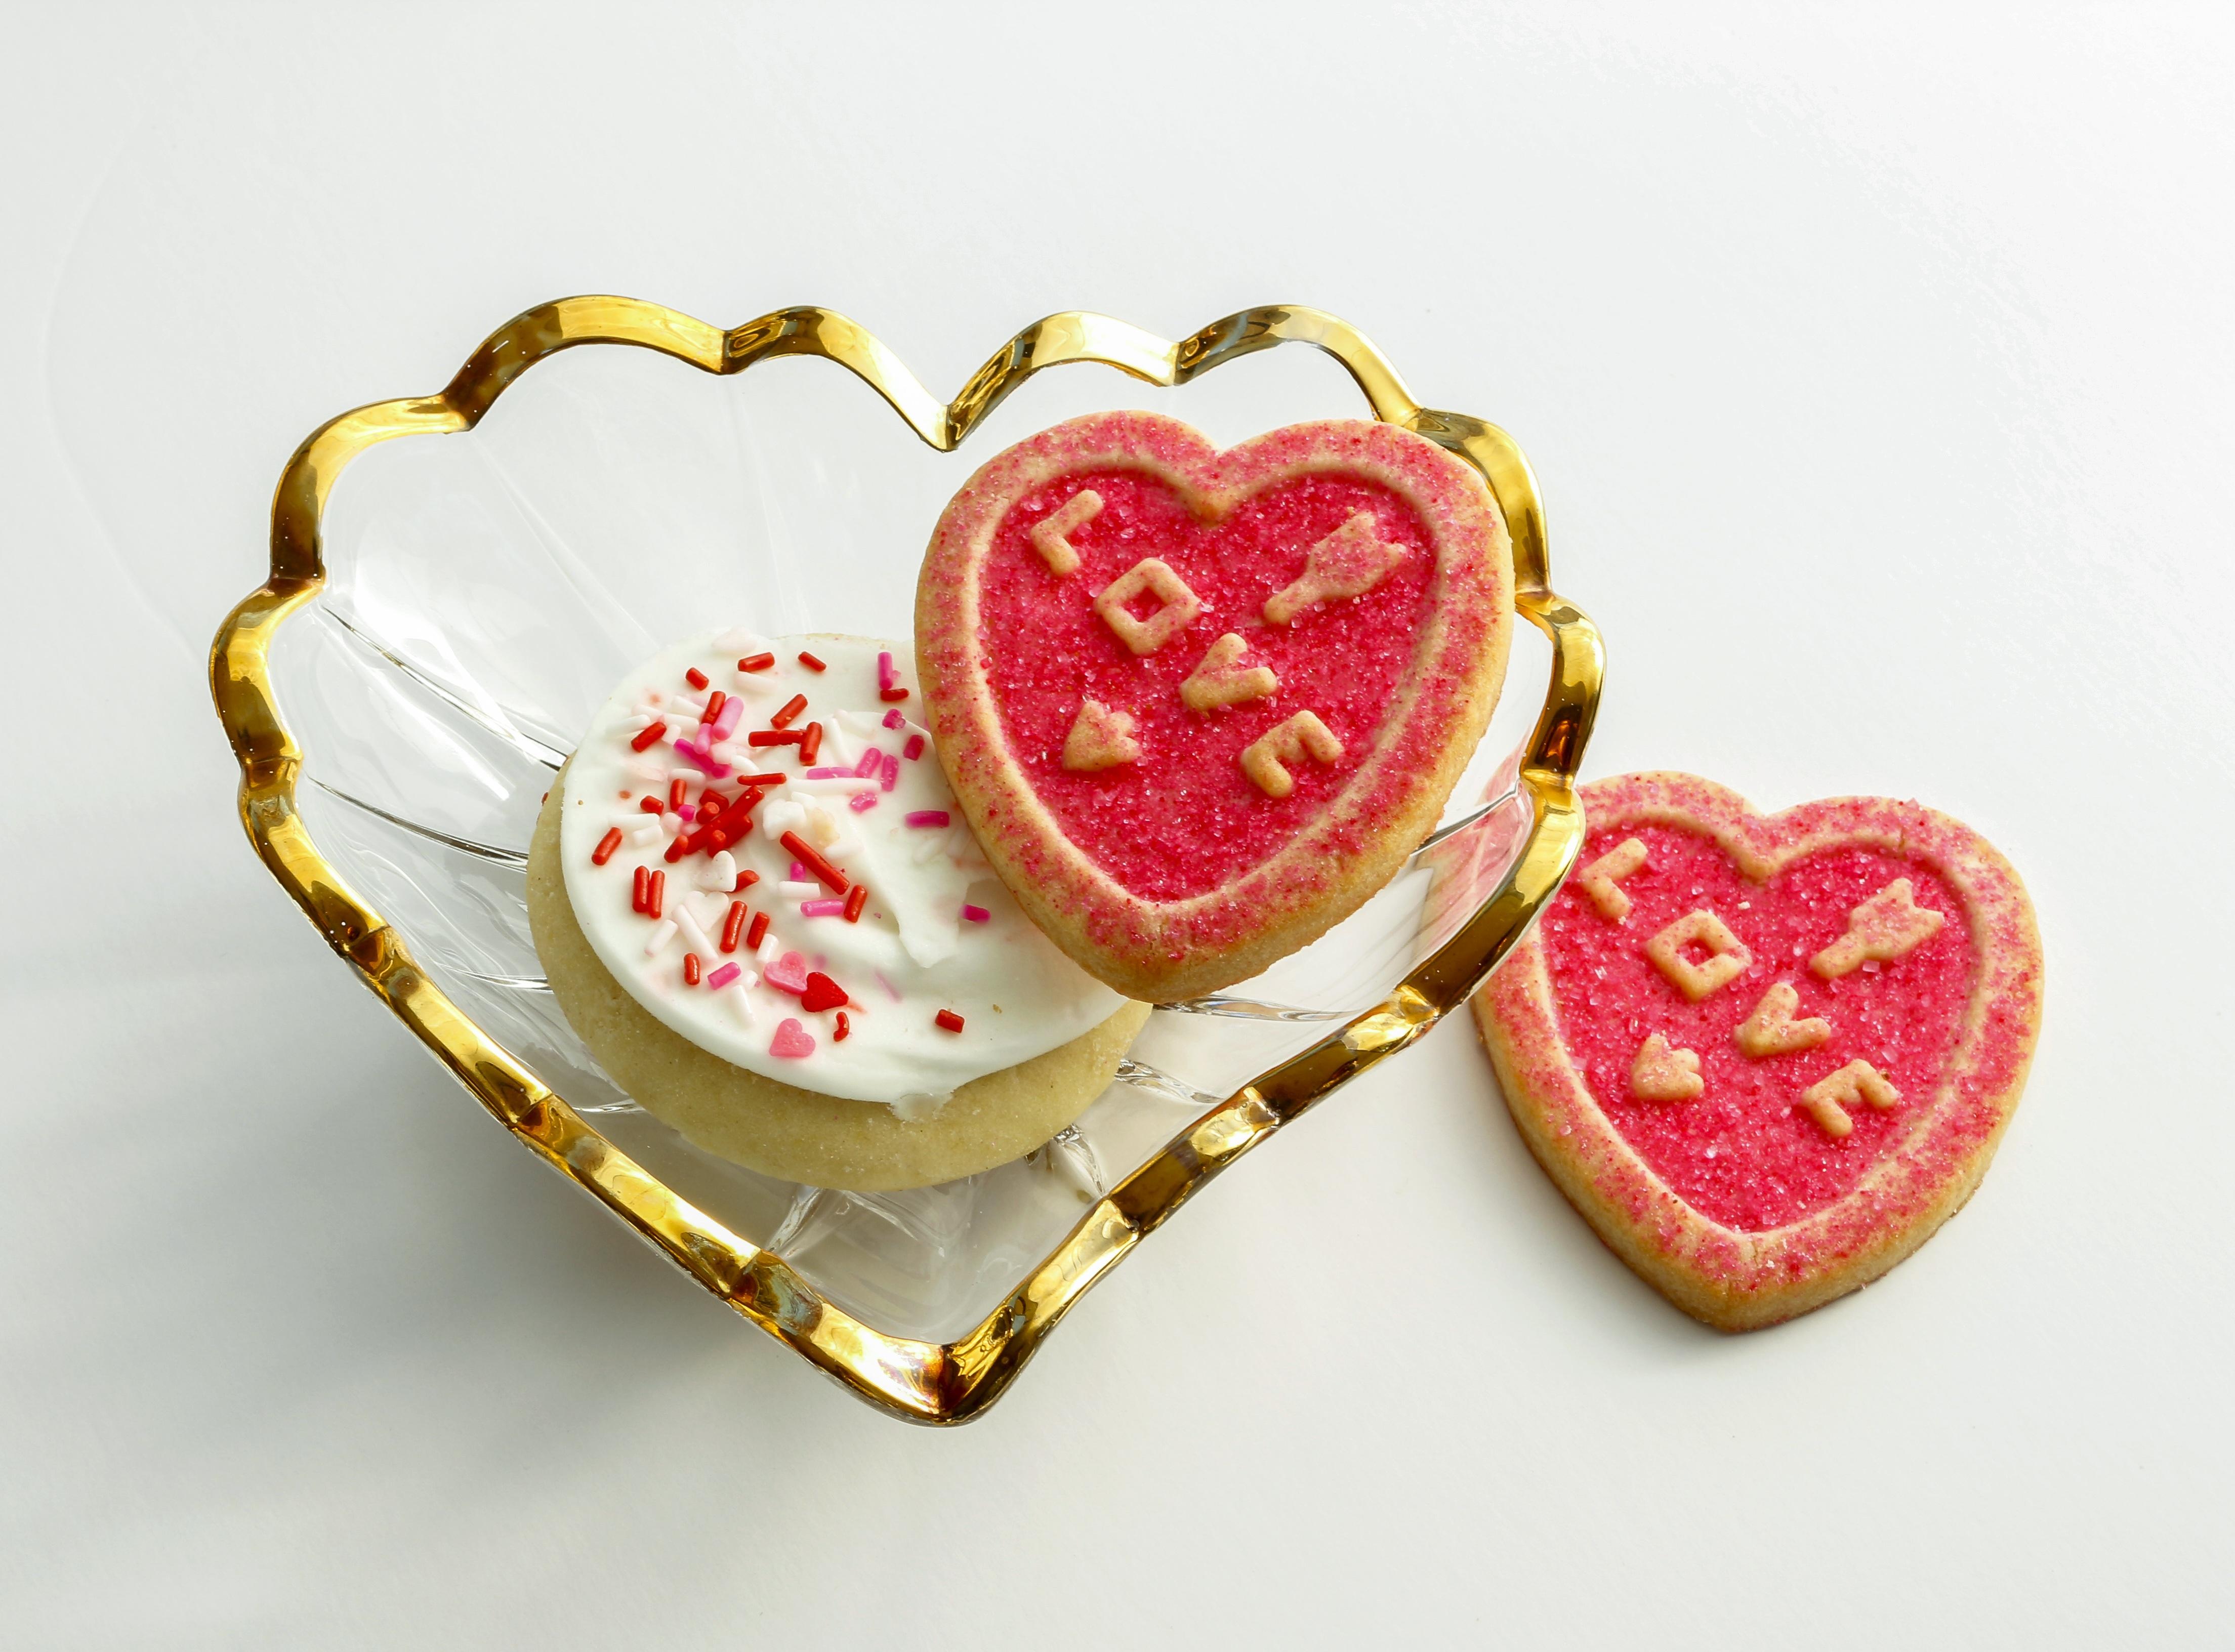 Valentine Fruit Free Images Fruit Sweet Flower Petal Heart Food Red